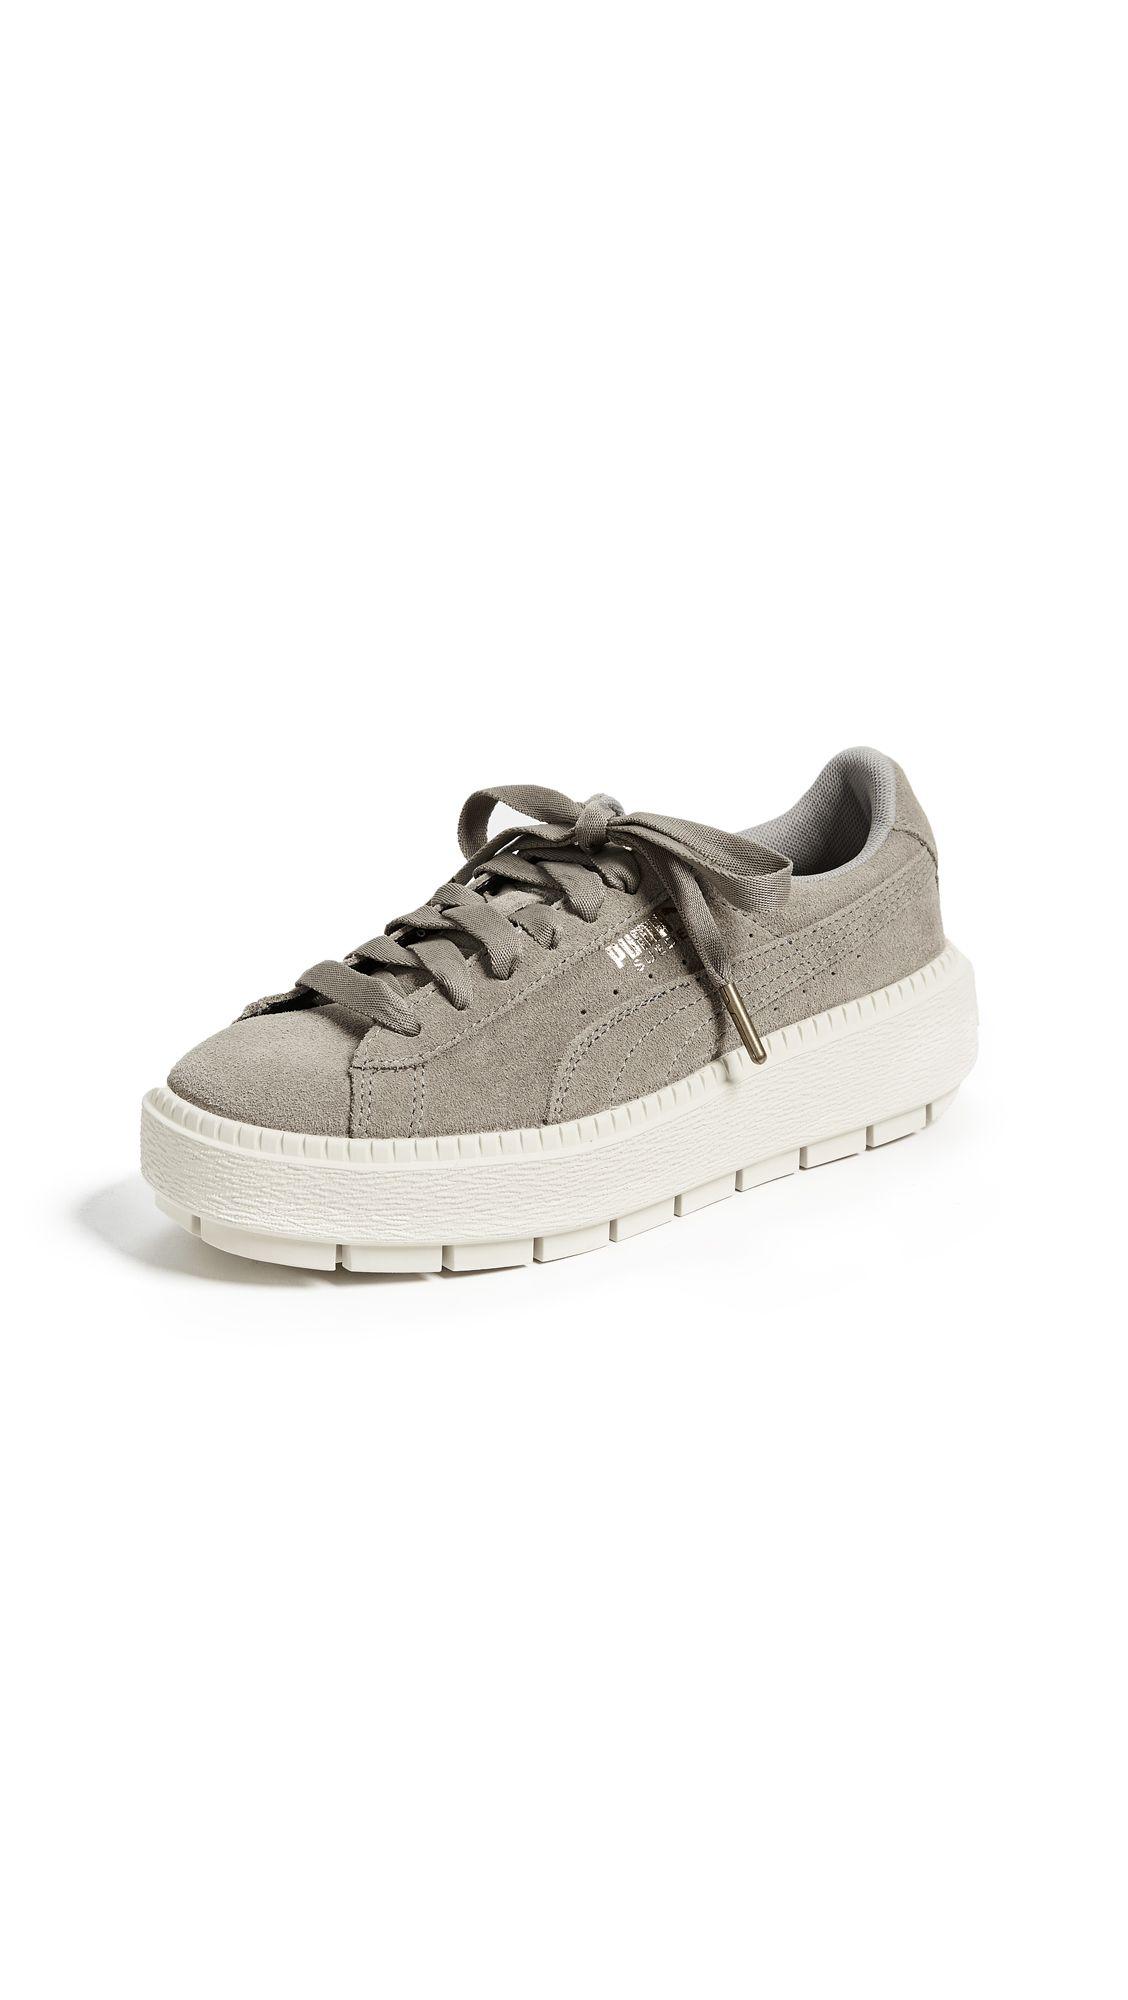 13a0995b7ef PUMA SUEDE PLATFORM TRACE SNEAKERS.  puma  shoes